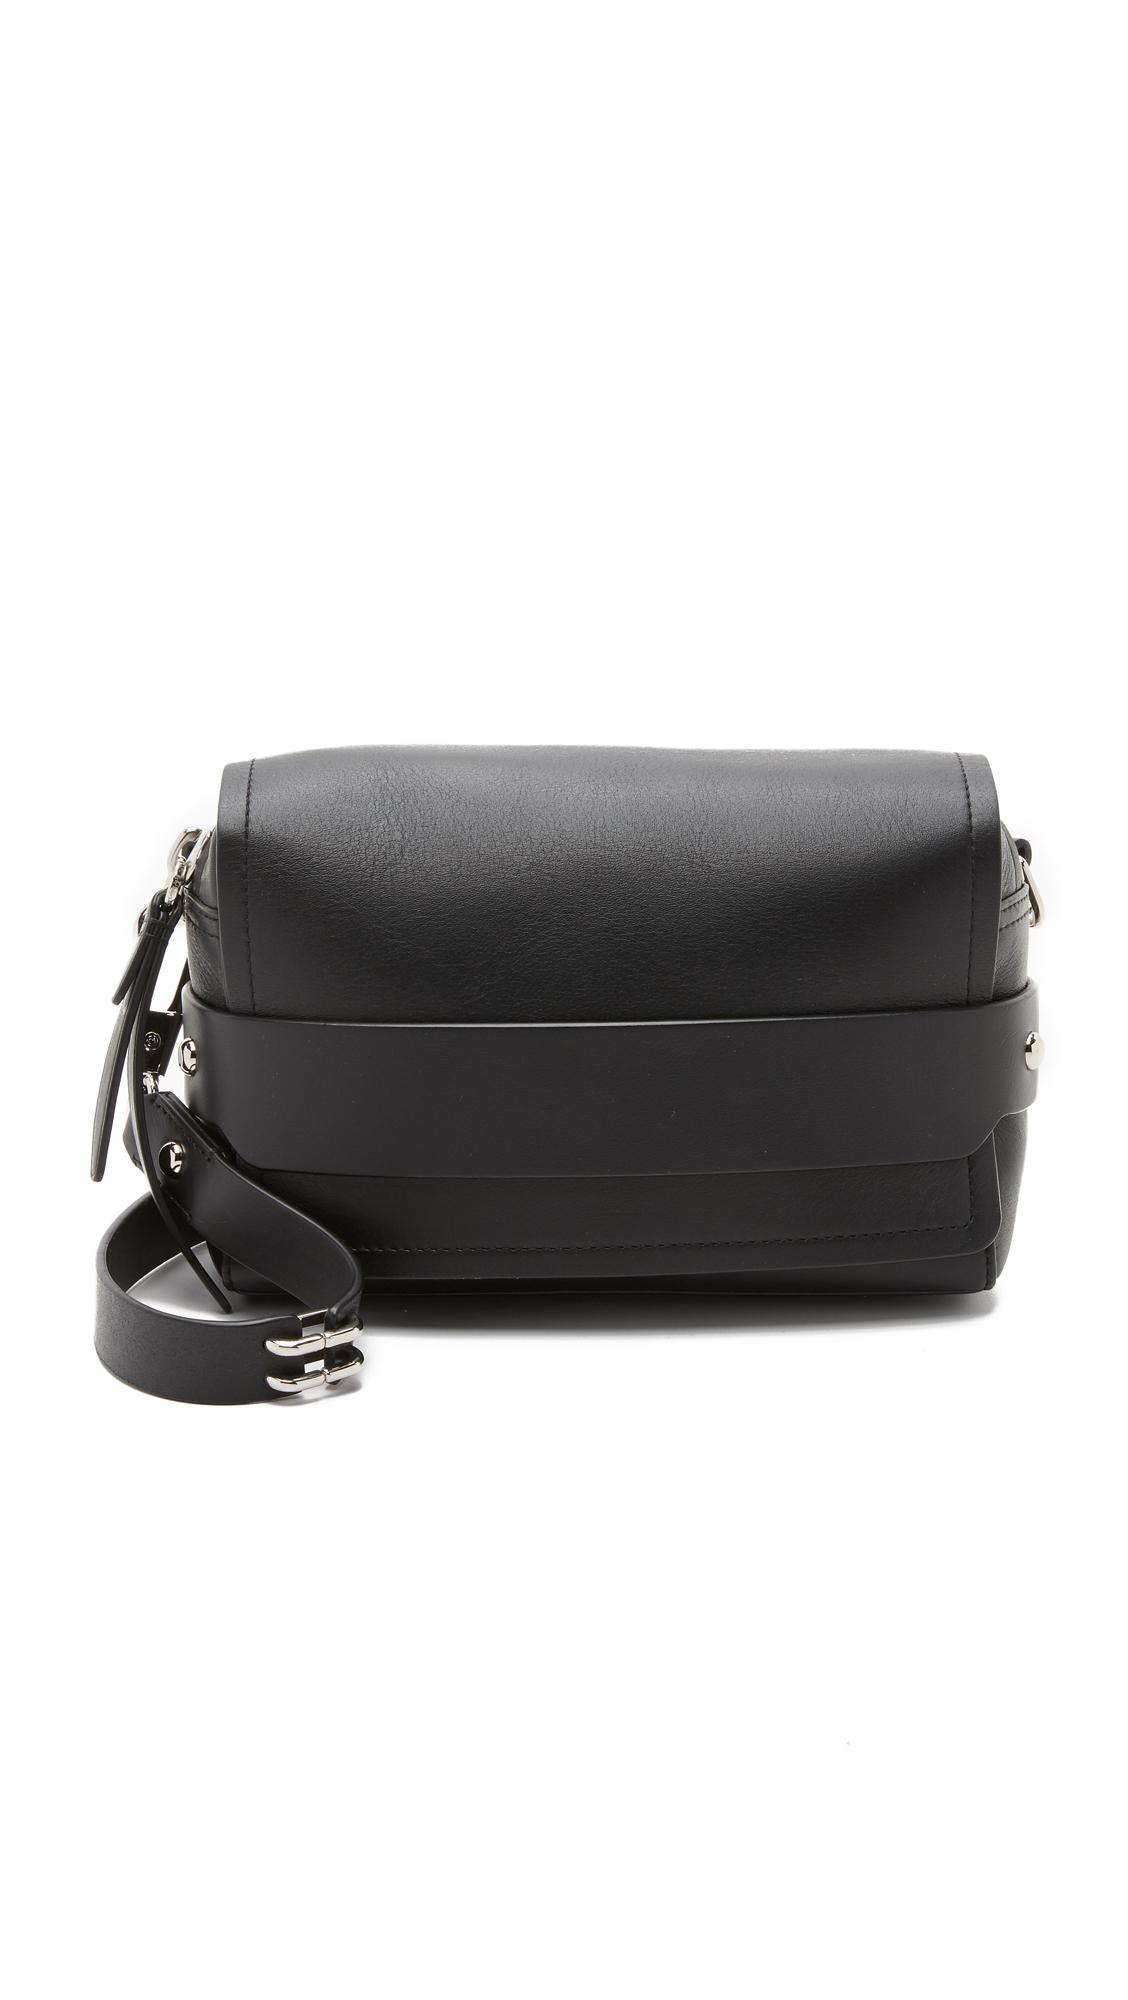 3.1 Phillip Lim Bianca Small Flap Cross Body Bag in Black